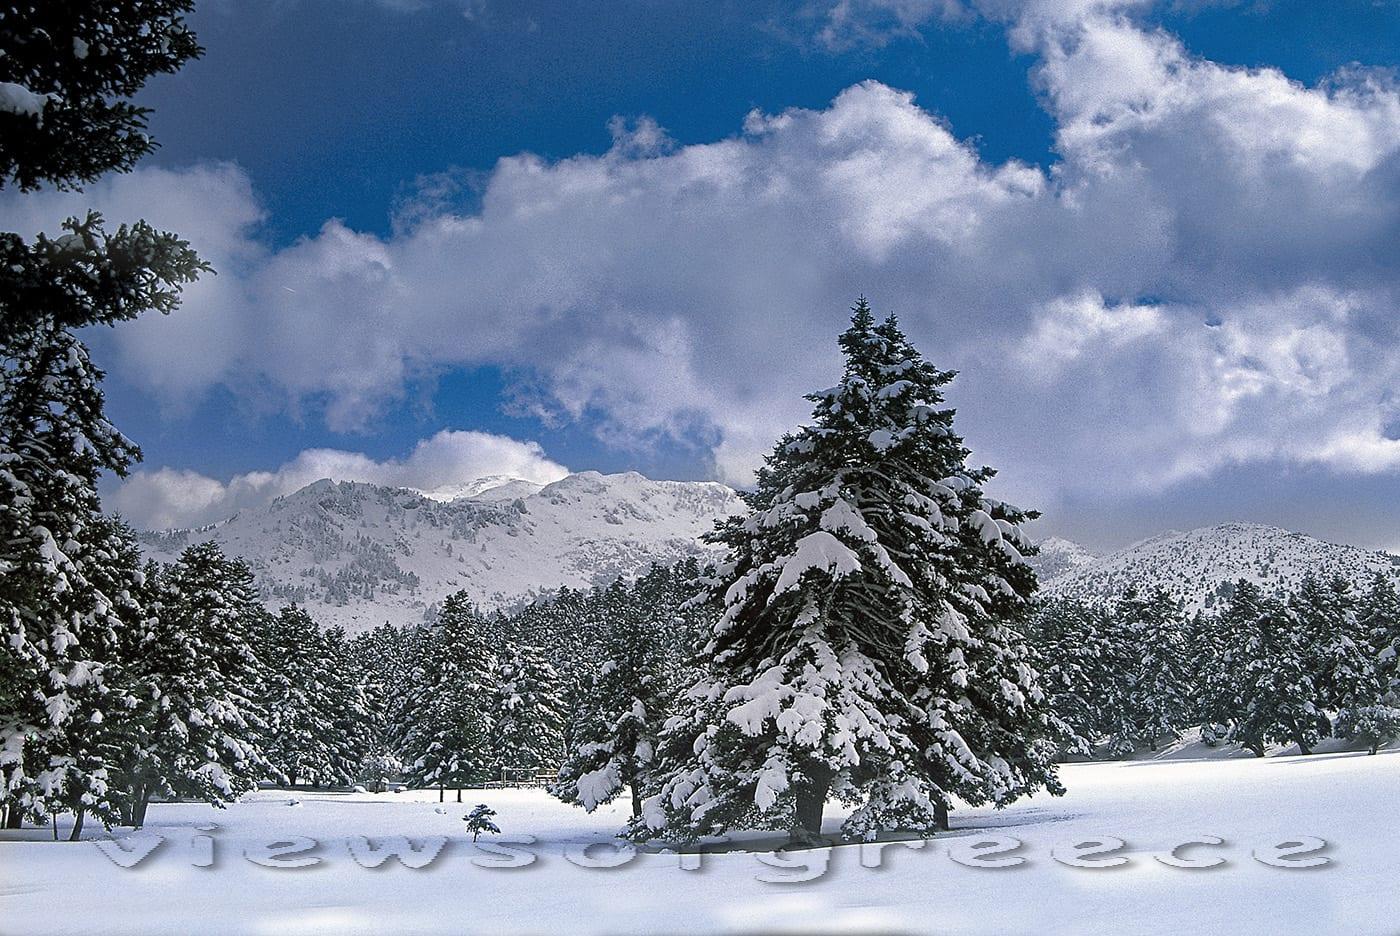 mountain, nature, travel, naturally, greece, plants, highlands, outdoor, forest, flora, Elikonas, Ελικώνας, Βοιωτία, Μούσες, Αγία Άννα, παραλίες, Αρβανίτσα, χλωρίδα